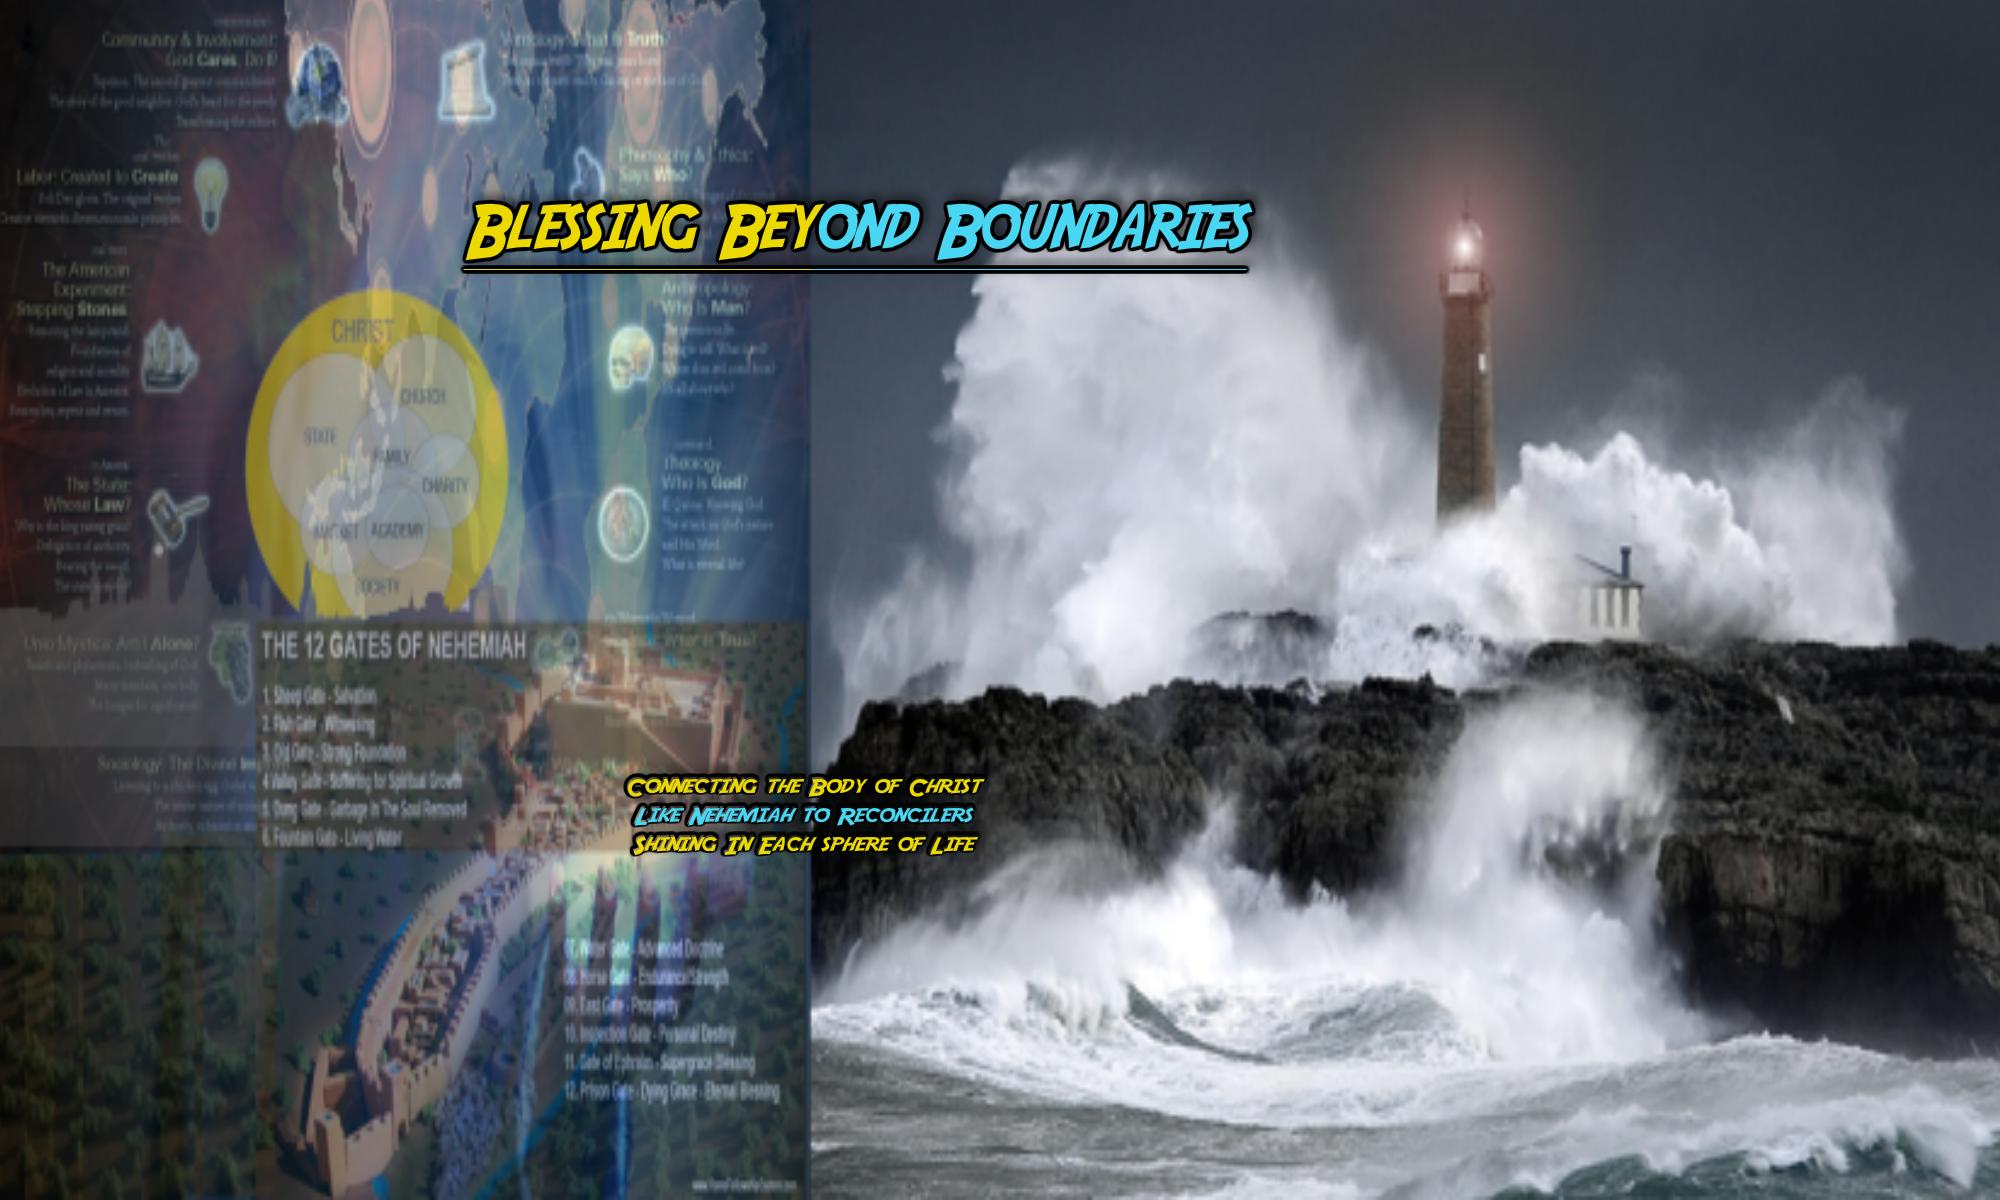 Blessing Beyond Boundaries